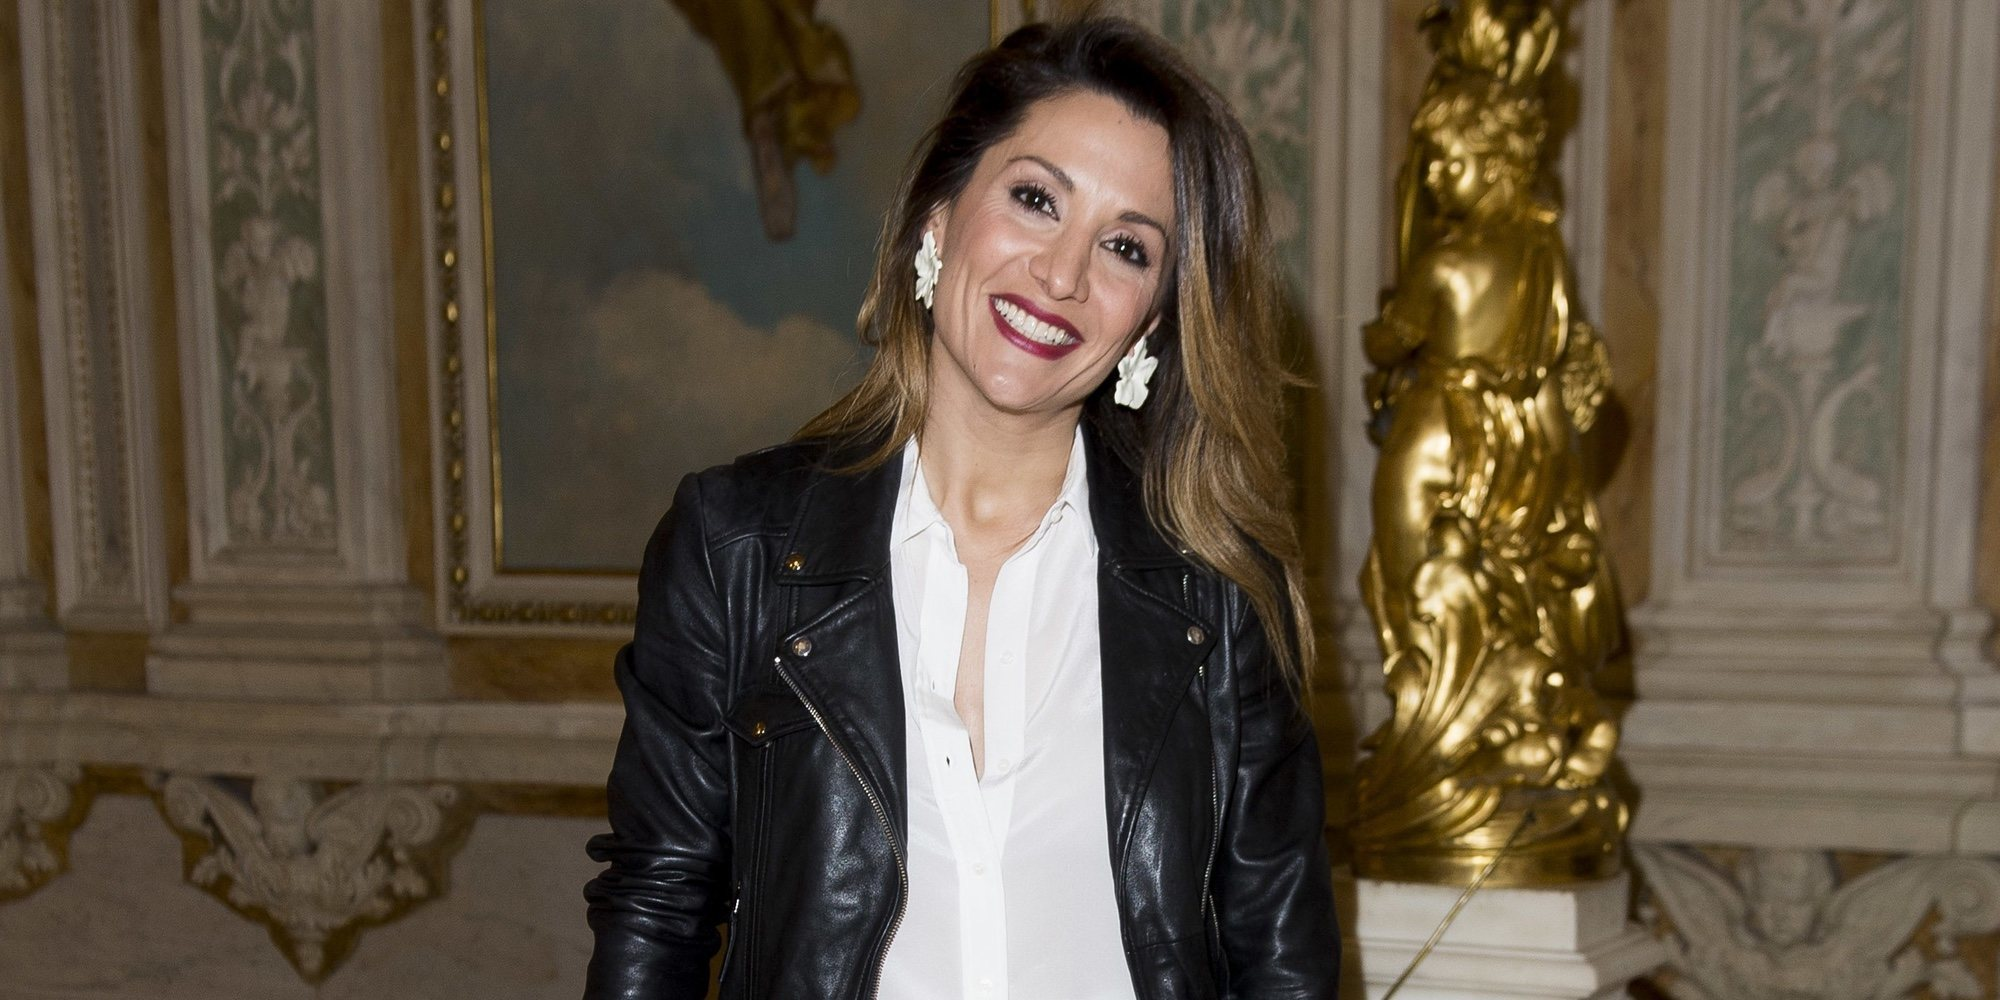 Nagore Gran Hermano Interviu nagore robles, al ser elegida presentadora de 'myhyv